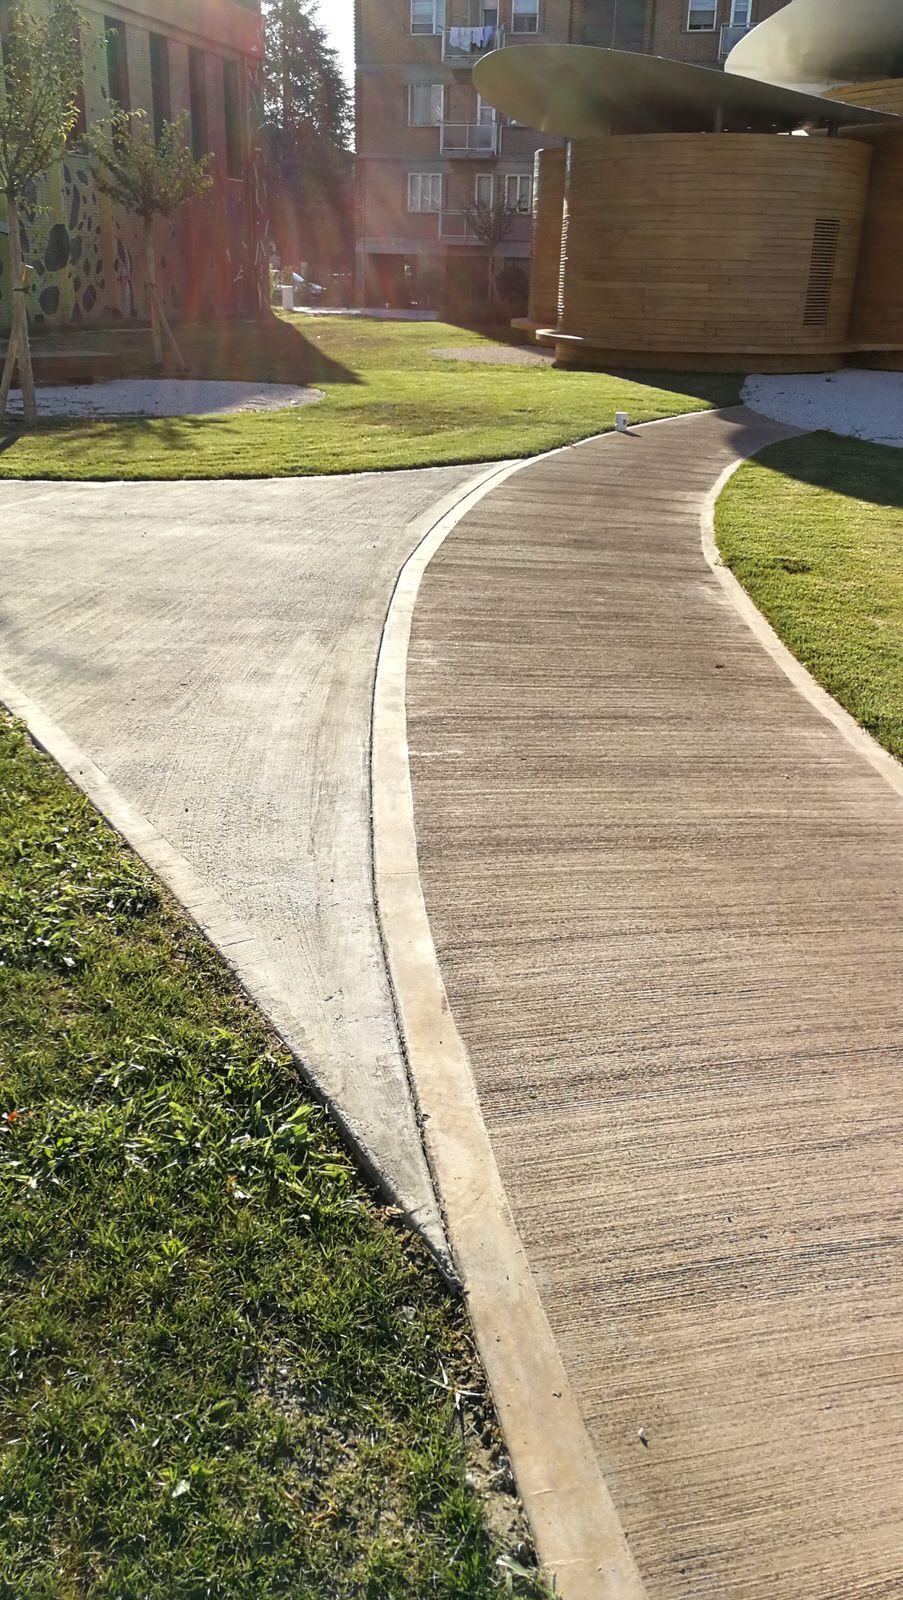 Pavimentare giardino economico pavimenti per esterni - Pavimenti da giardino economici ...